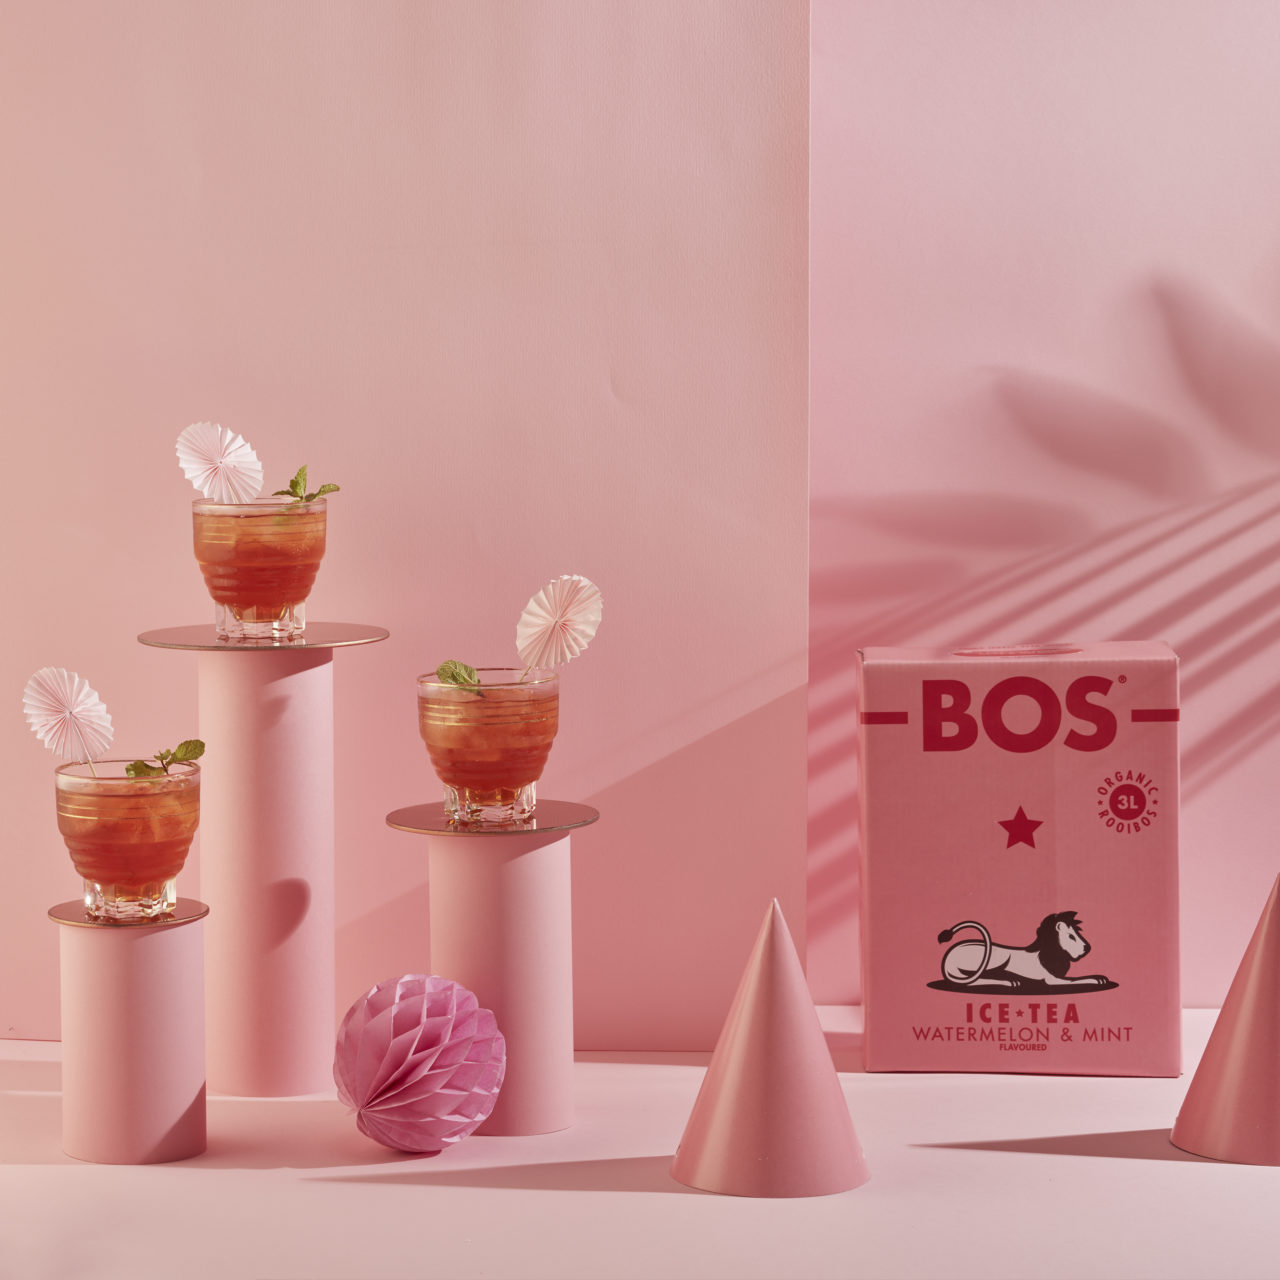 30_bos_ice_tea_watermelon_&_mint_sa_1747_Justin Patrick_product shoot_cape town